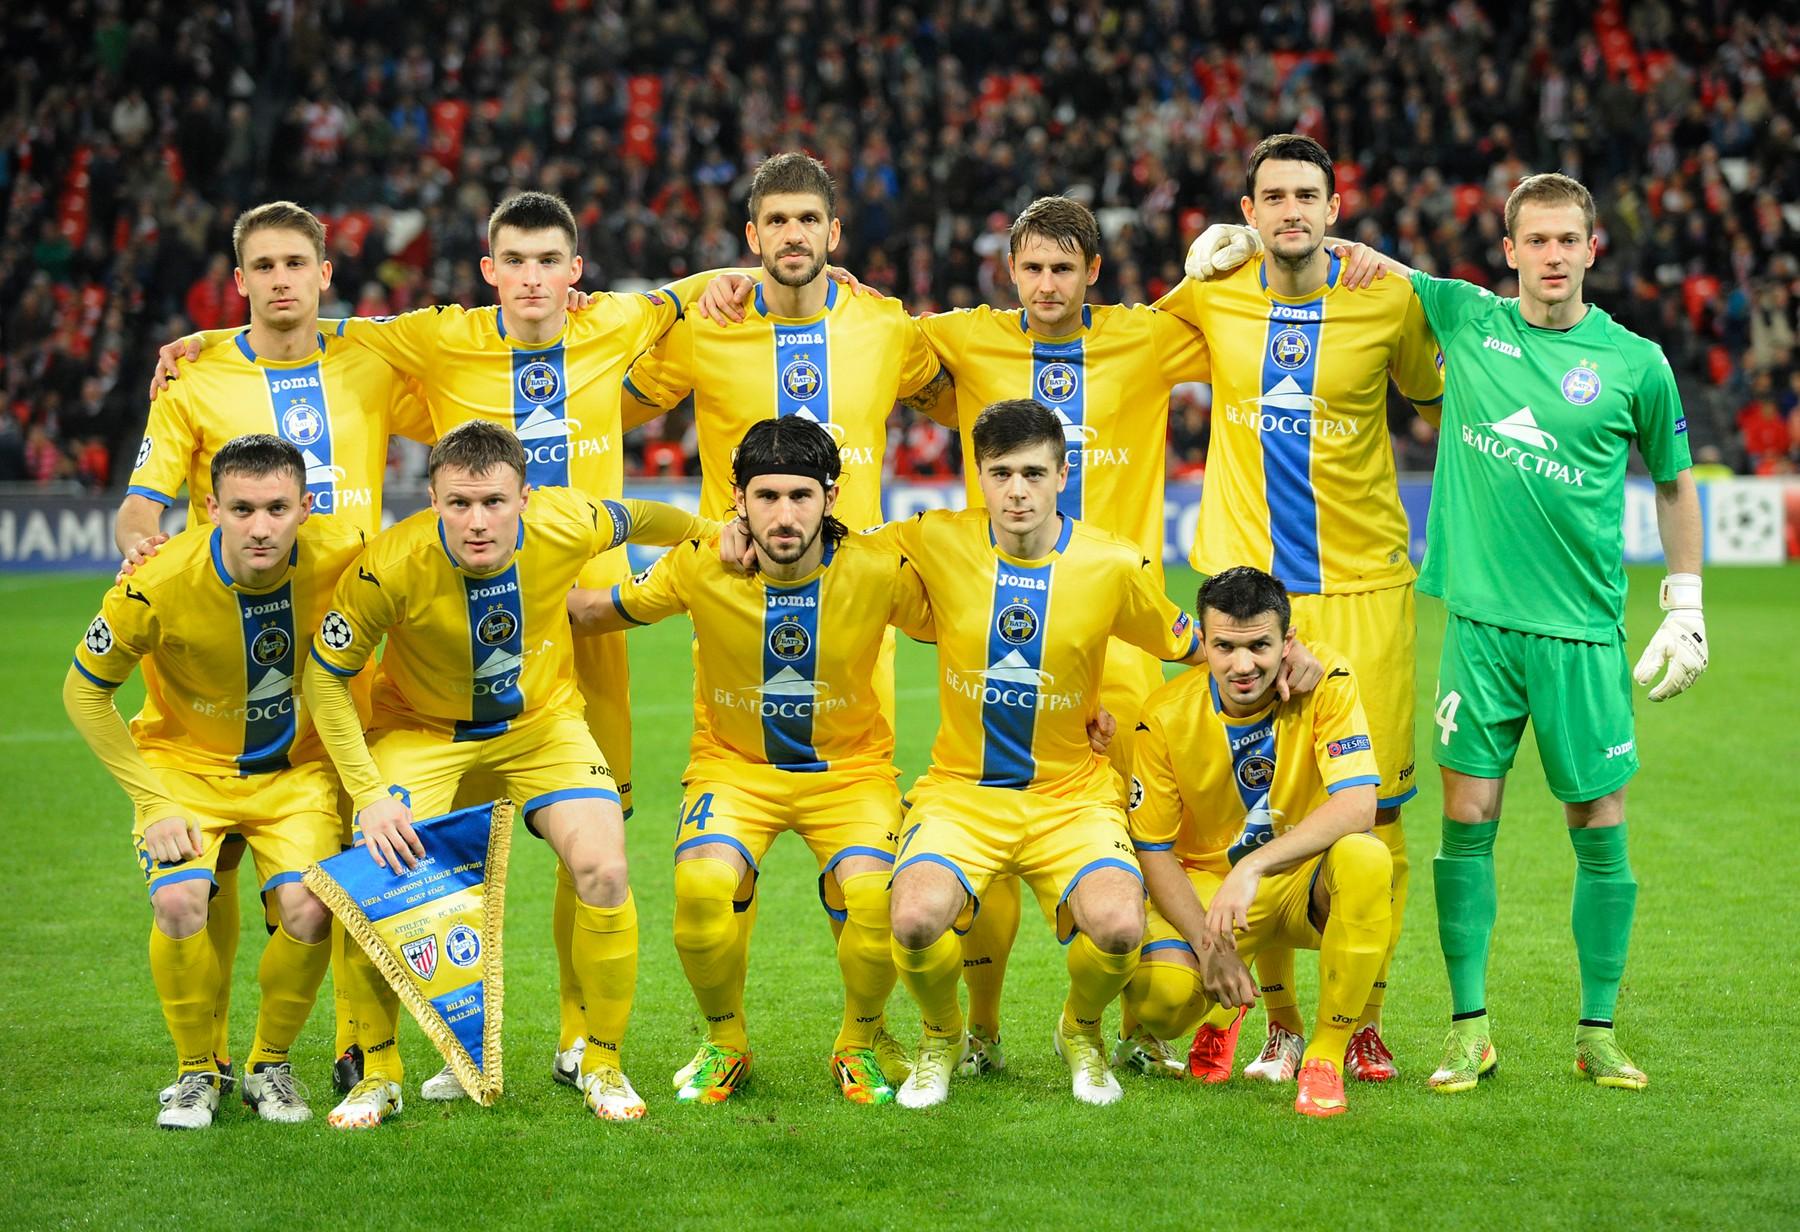 BATE Borisov – Belarus' Football Factory